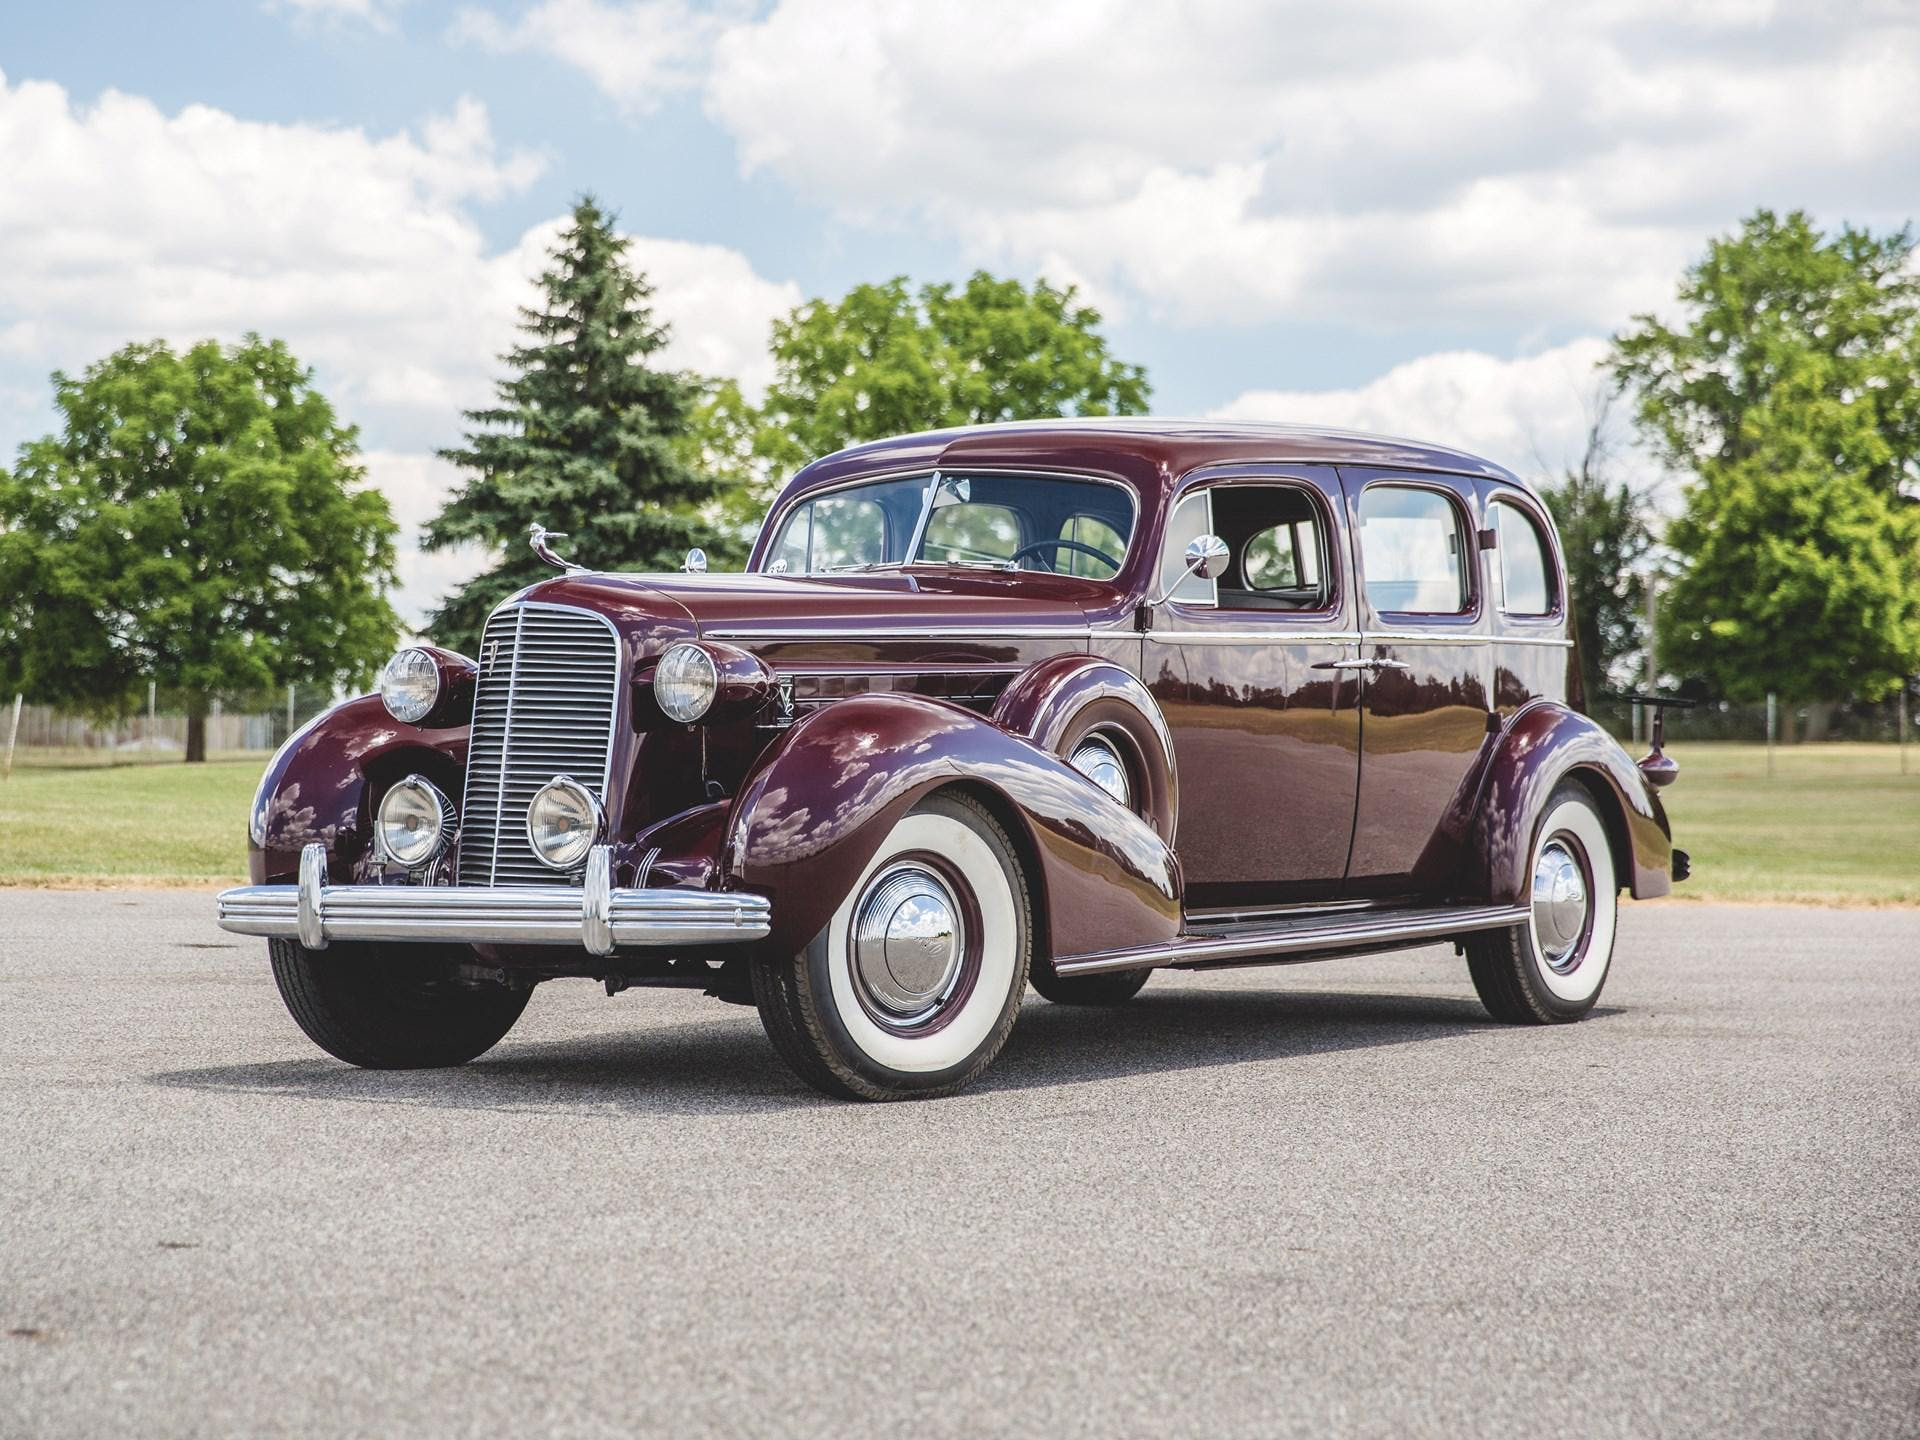 1936 Cadillac V-12 Town Sedan